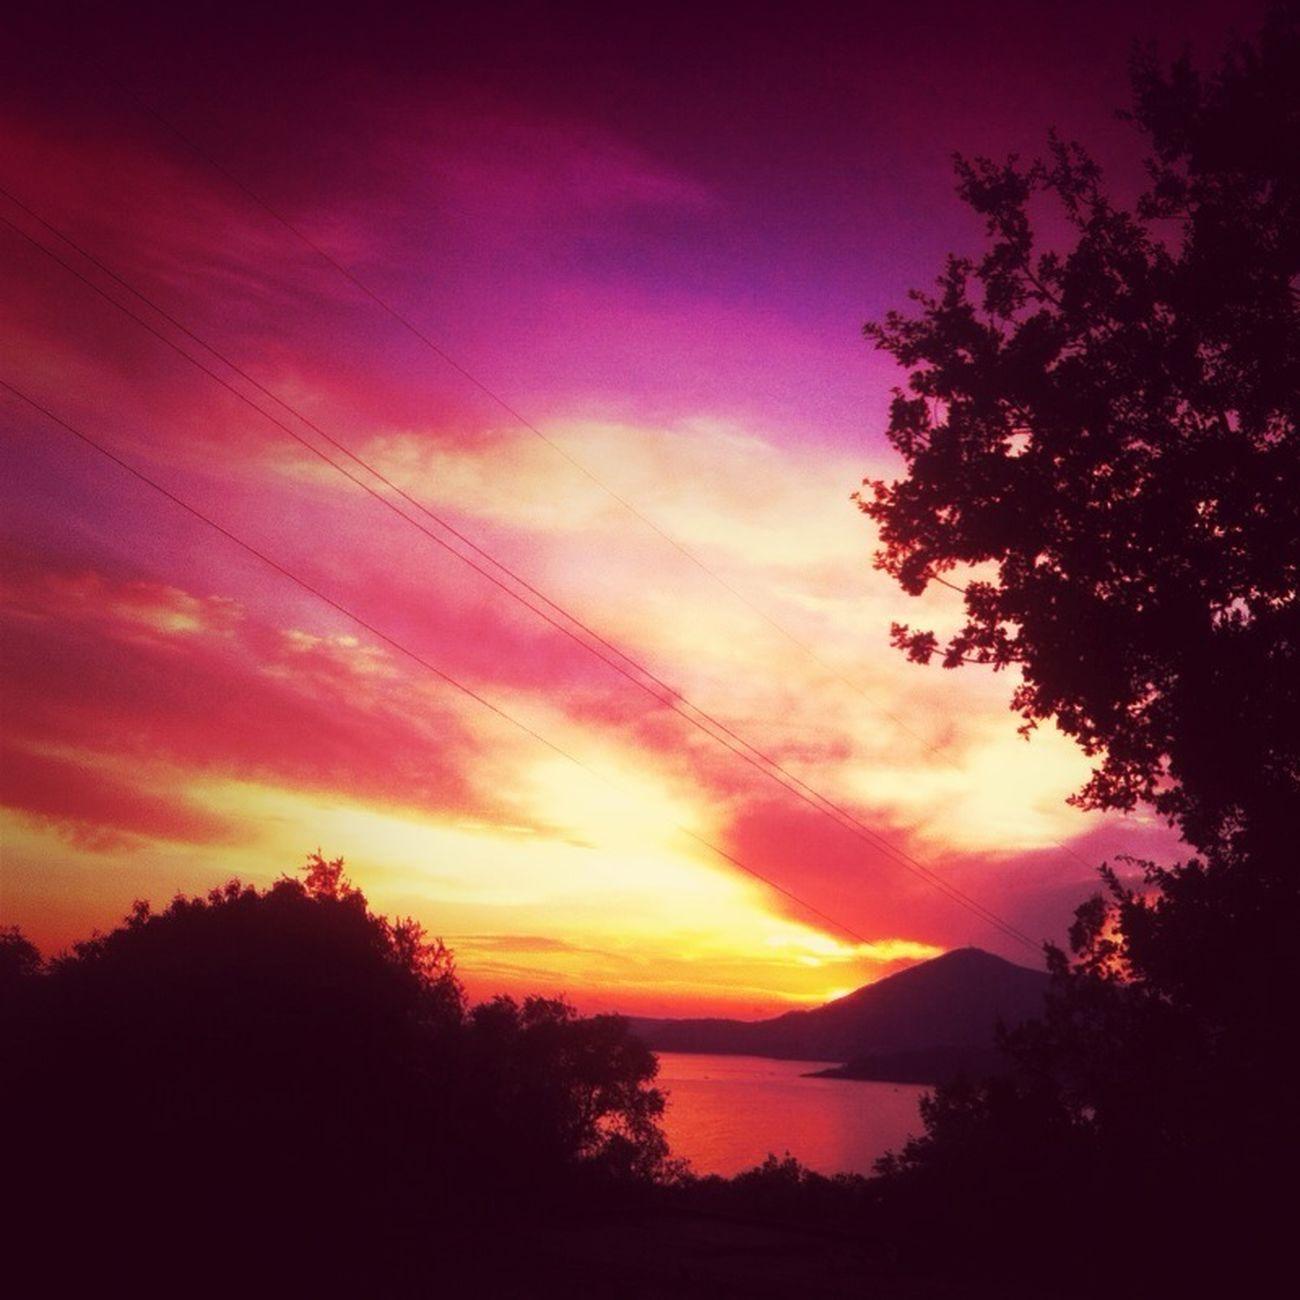 Sea Sunset Sky Landscape Trees All_shots Genginsapgan Gang_family